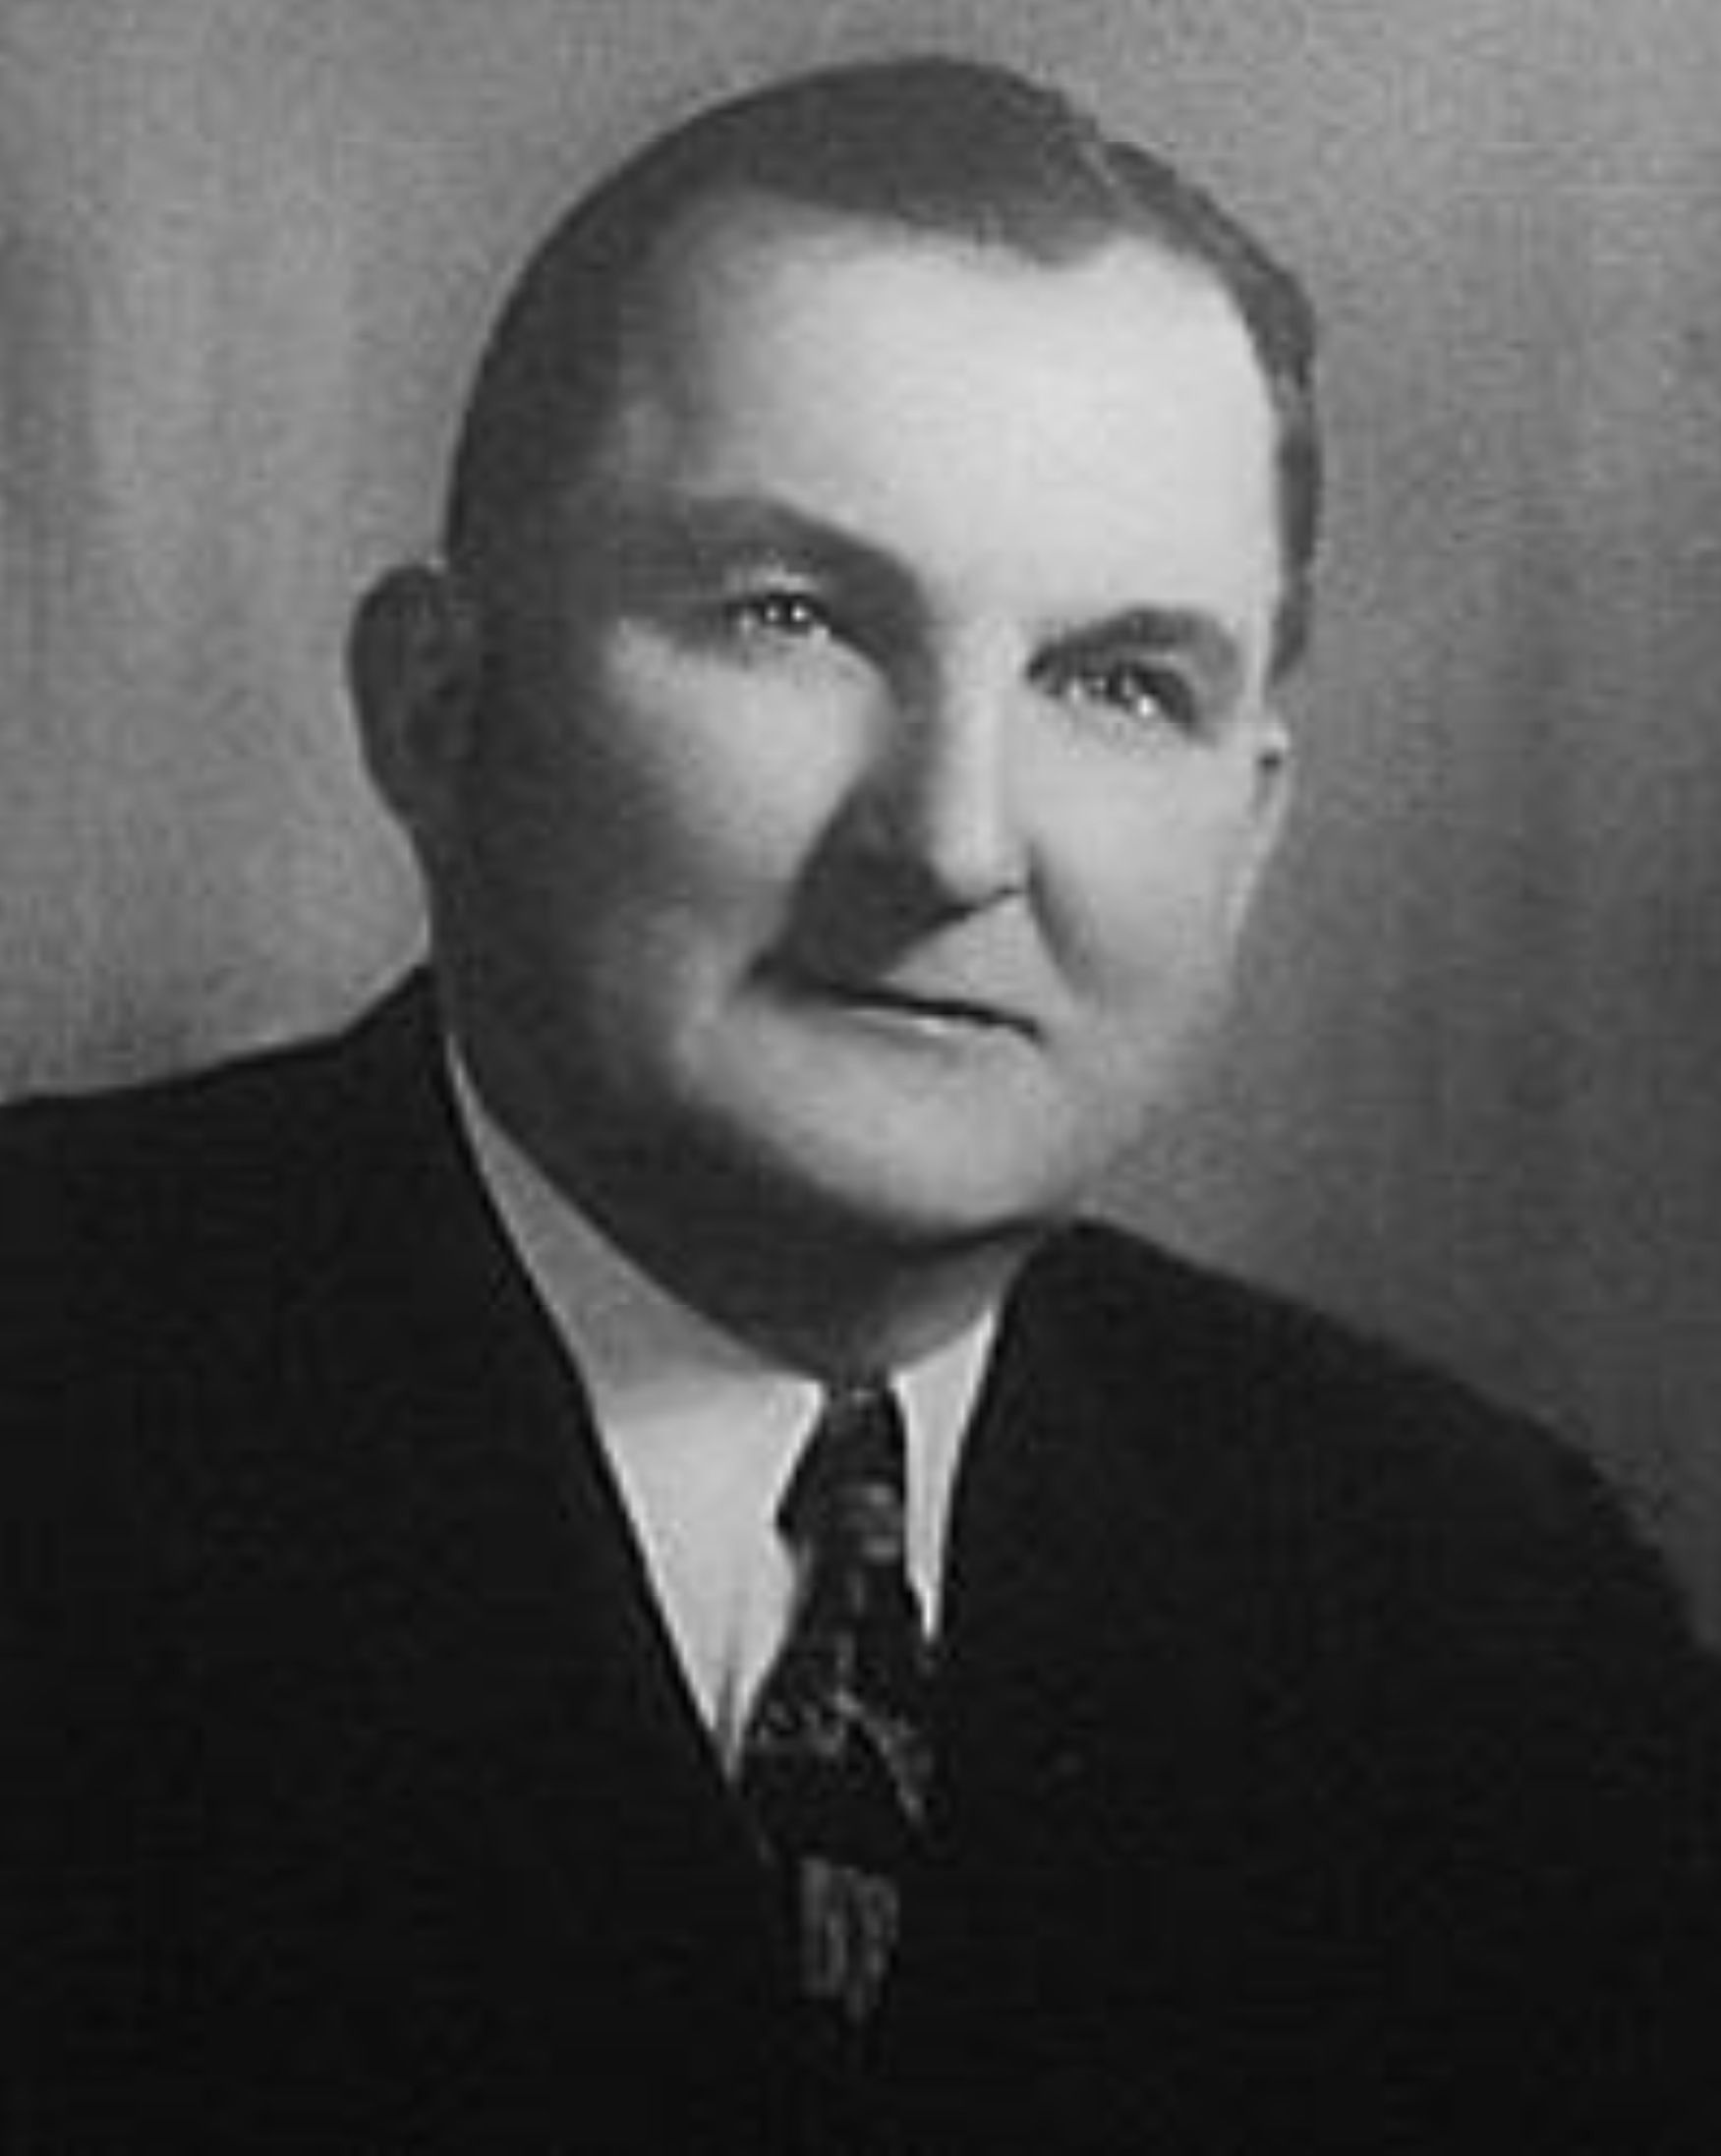 JOSEPH AYLWARD